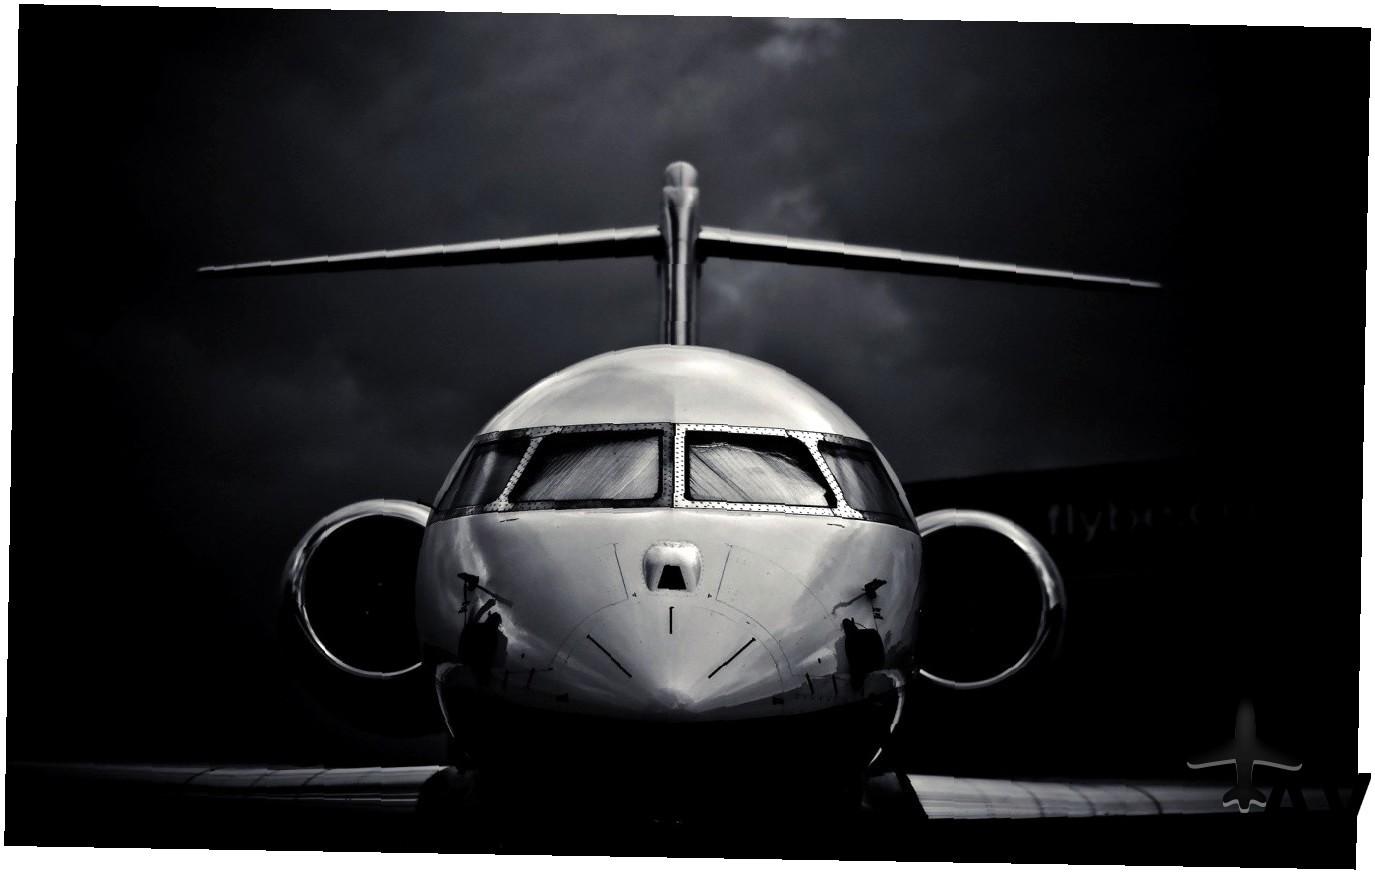 Региональный аэропорт Рапид-Сити код IATA: RAP ICAO: KRAP Рапид Сити США